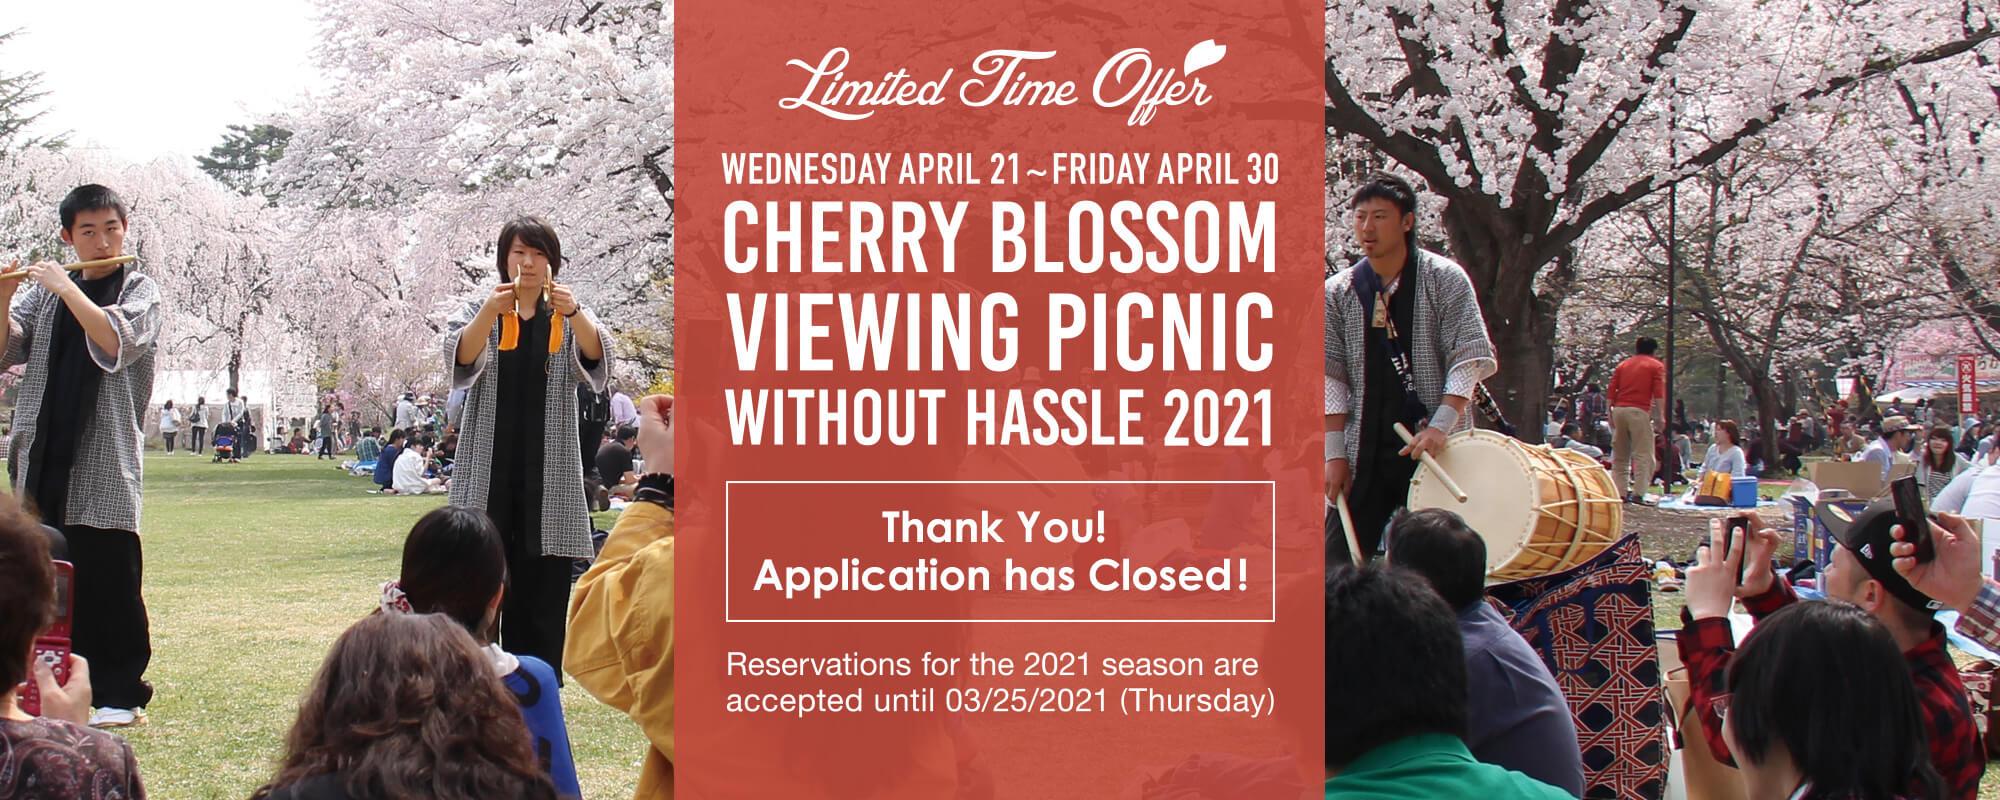 Enjoying the Cherry Blossoms at Hirosaki Park, a Famous Sakura Sight